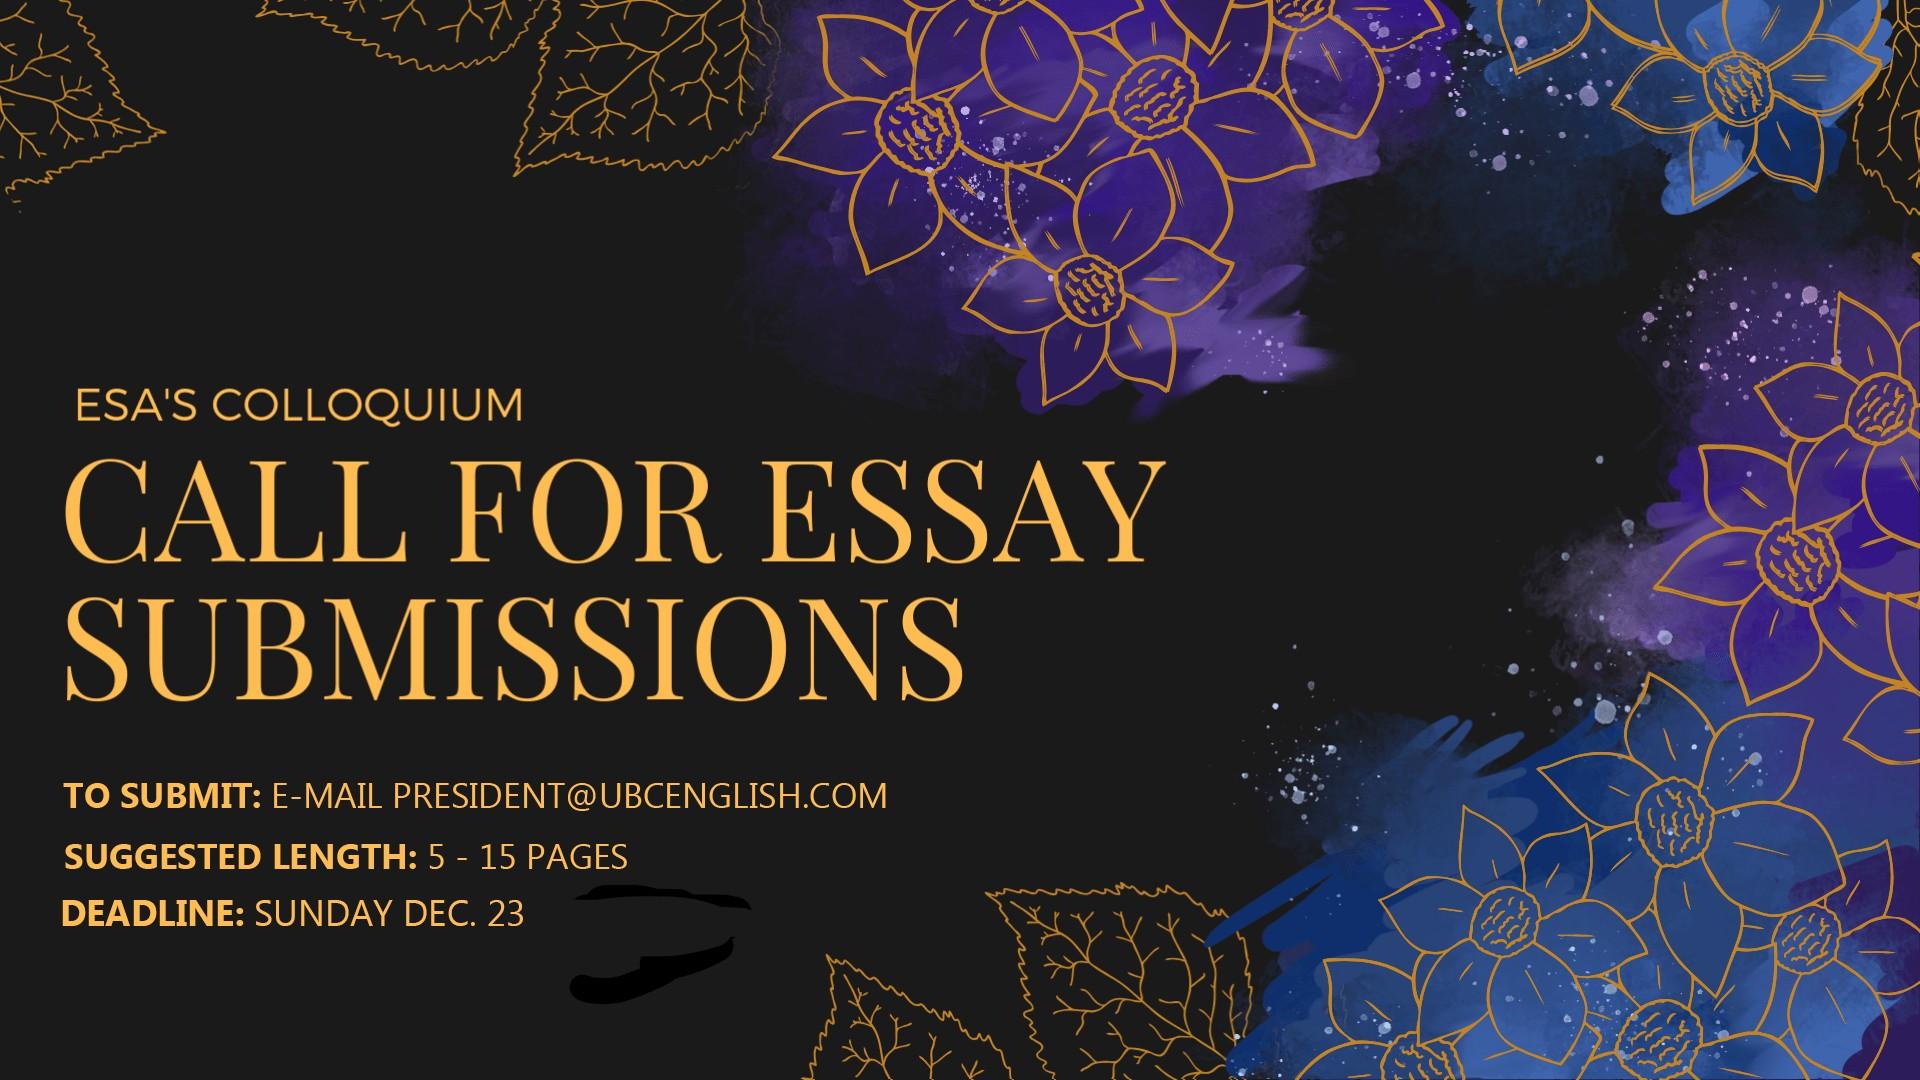 021 Essay Submissions Colloquium Final V3fit19202c1080 Impressive Buzzfeed Personal Ireland 2018 1920